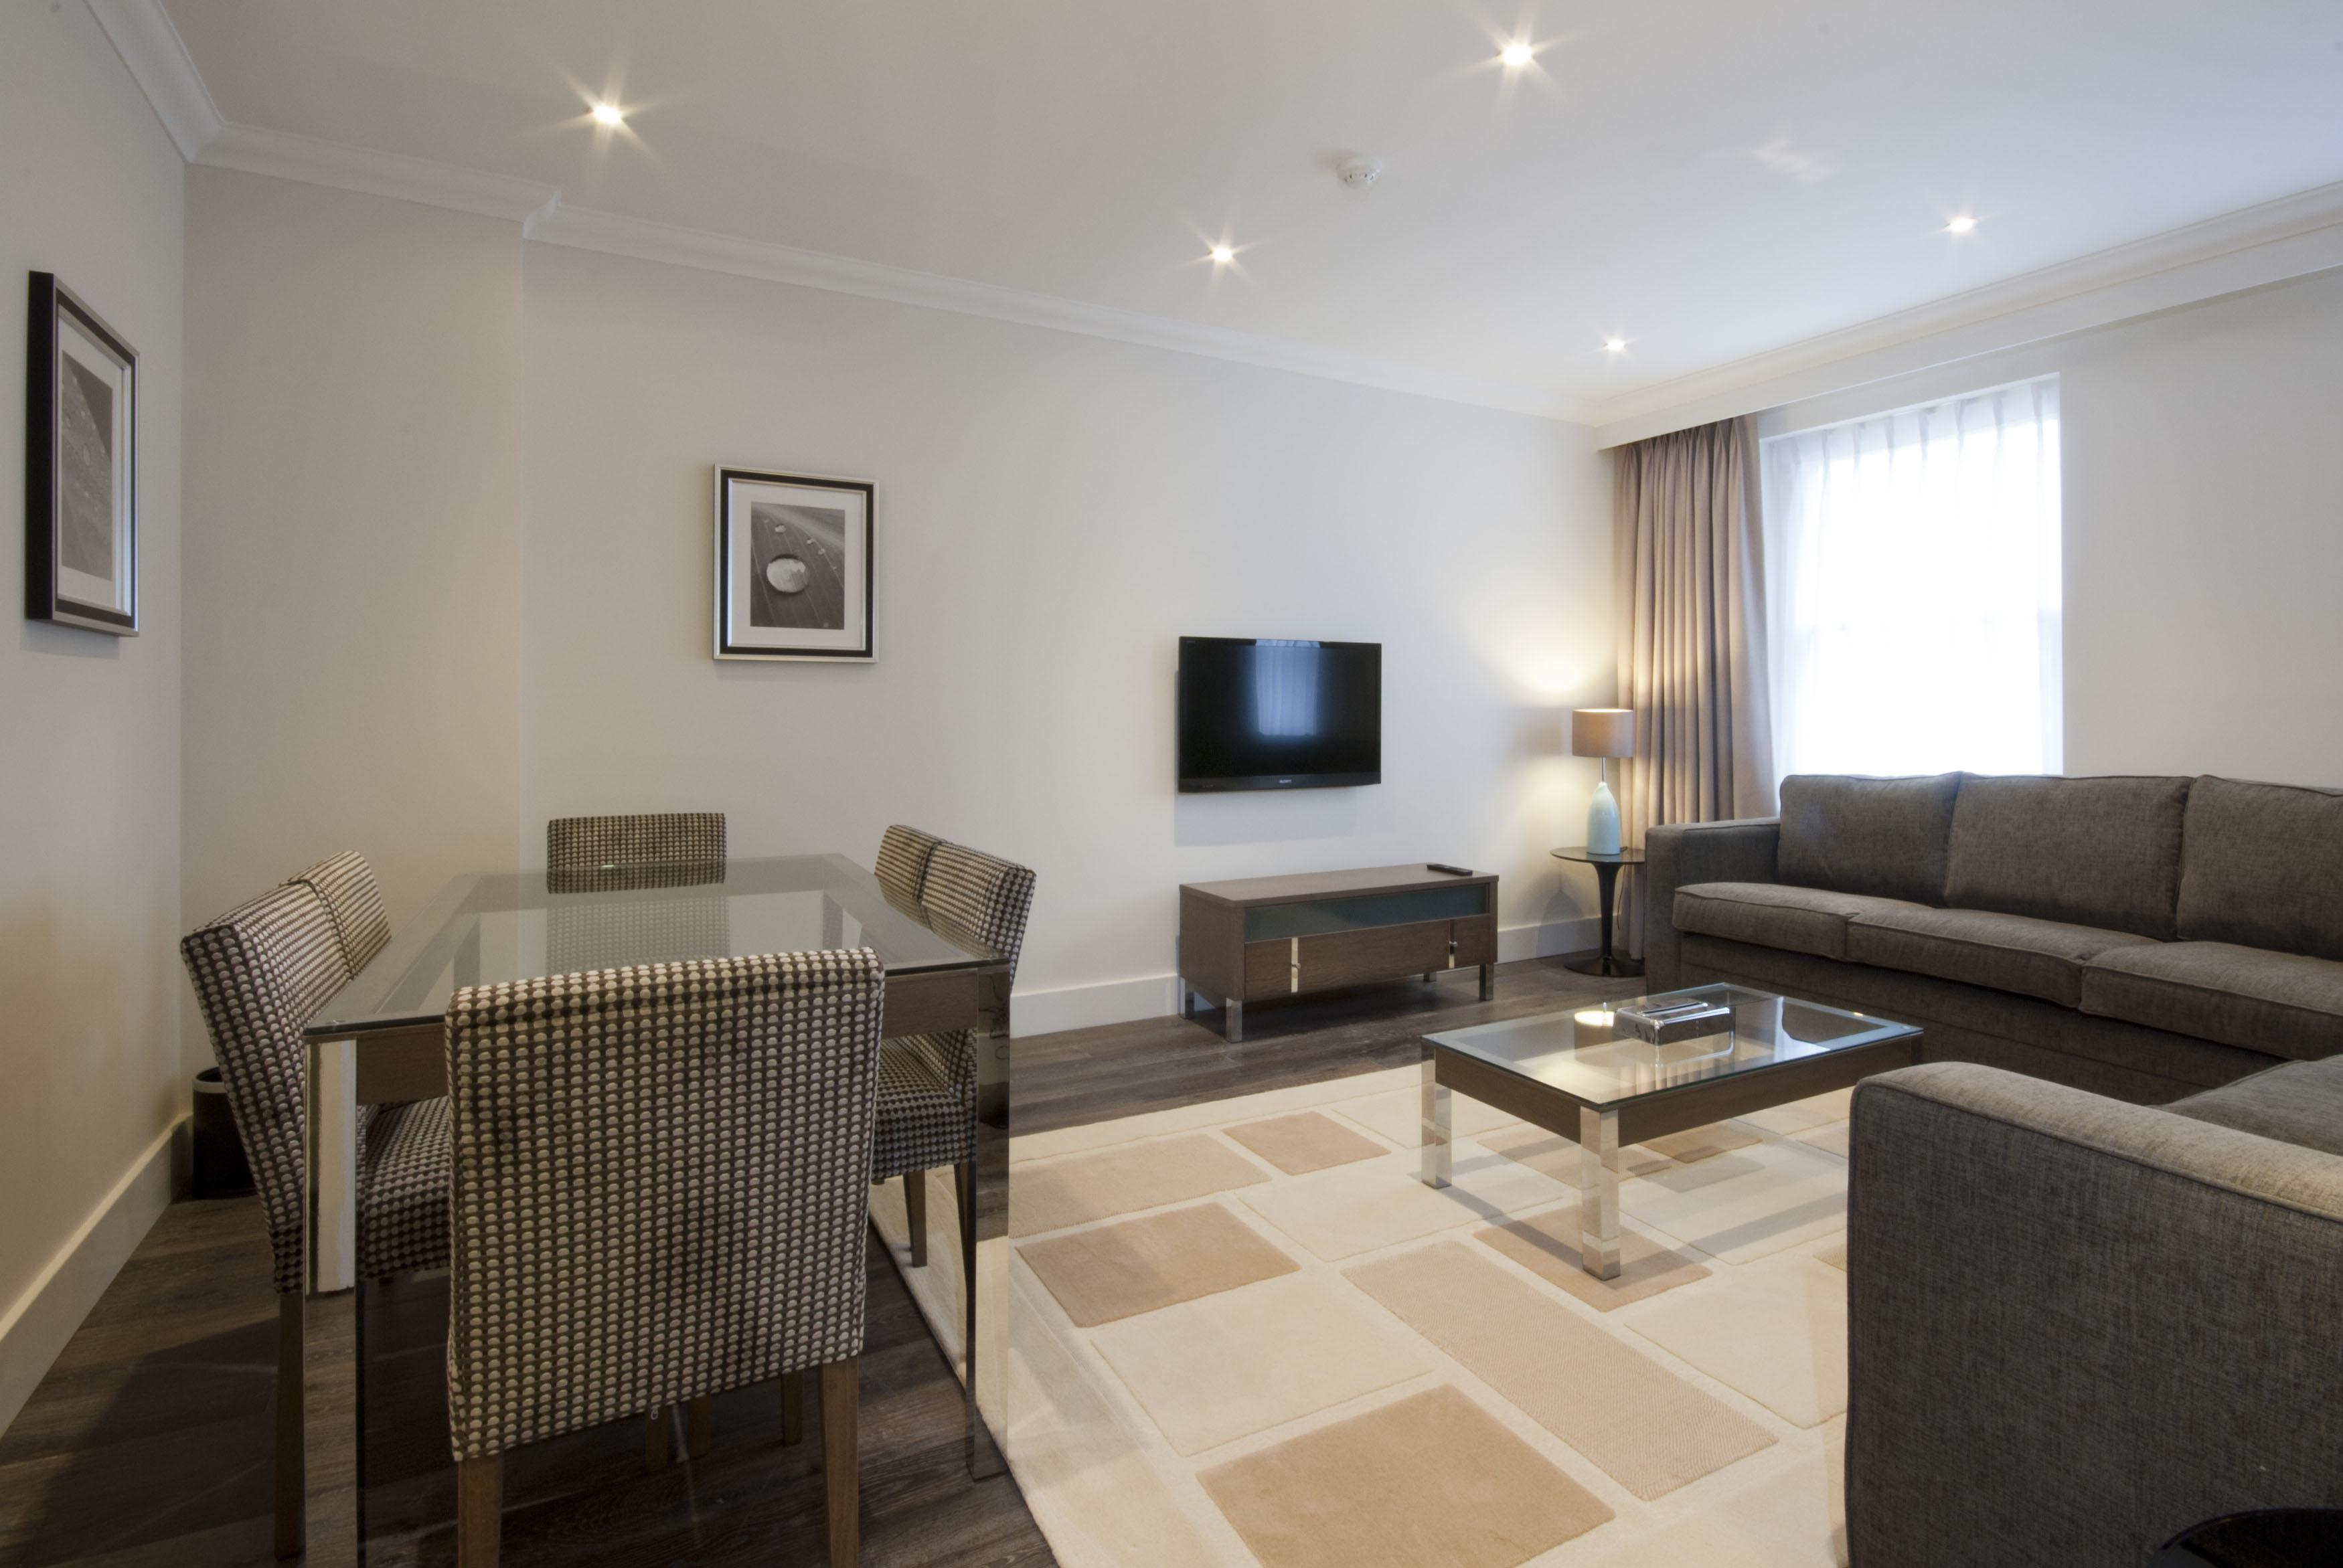 401 - two bedroom - Deluxe - living - dinning room 2.jpg